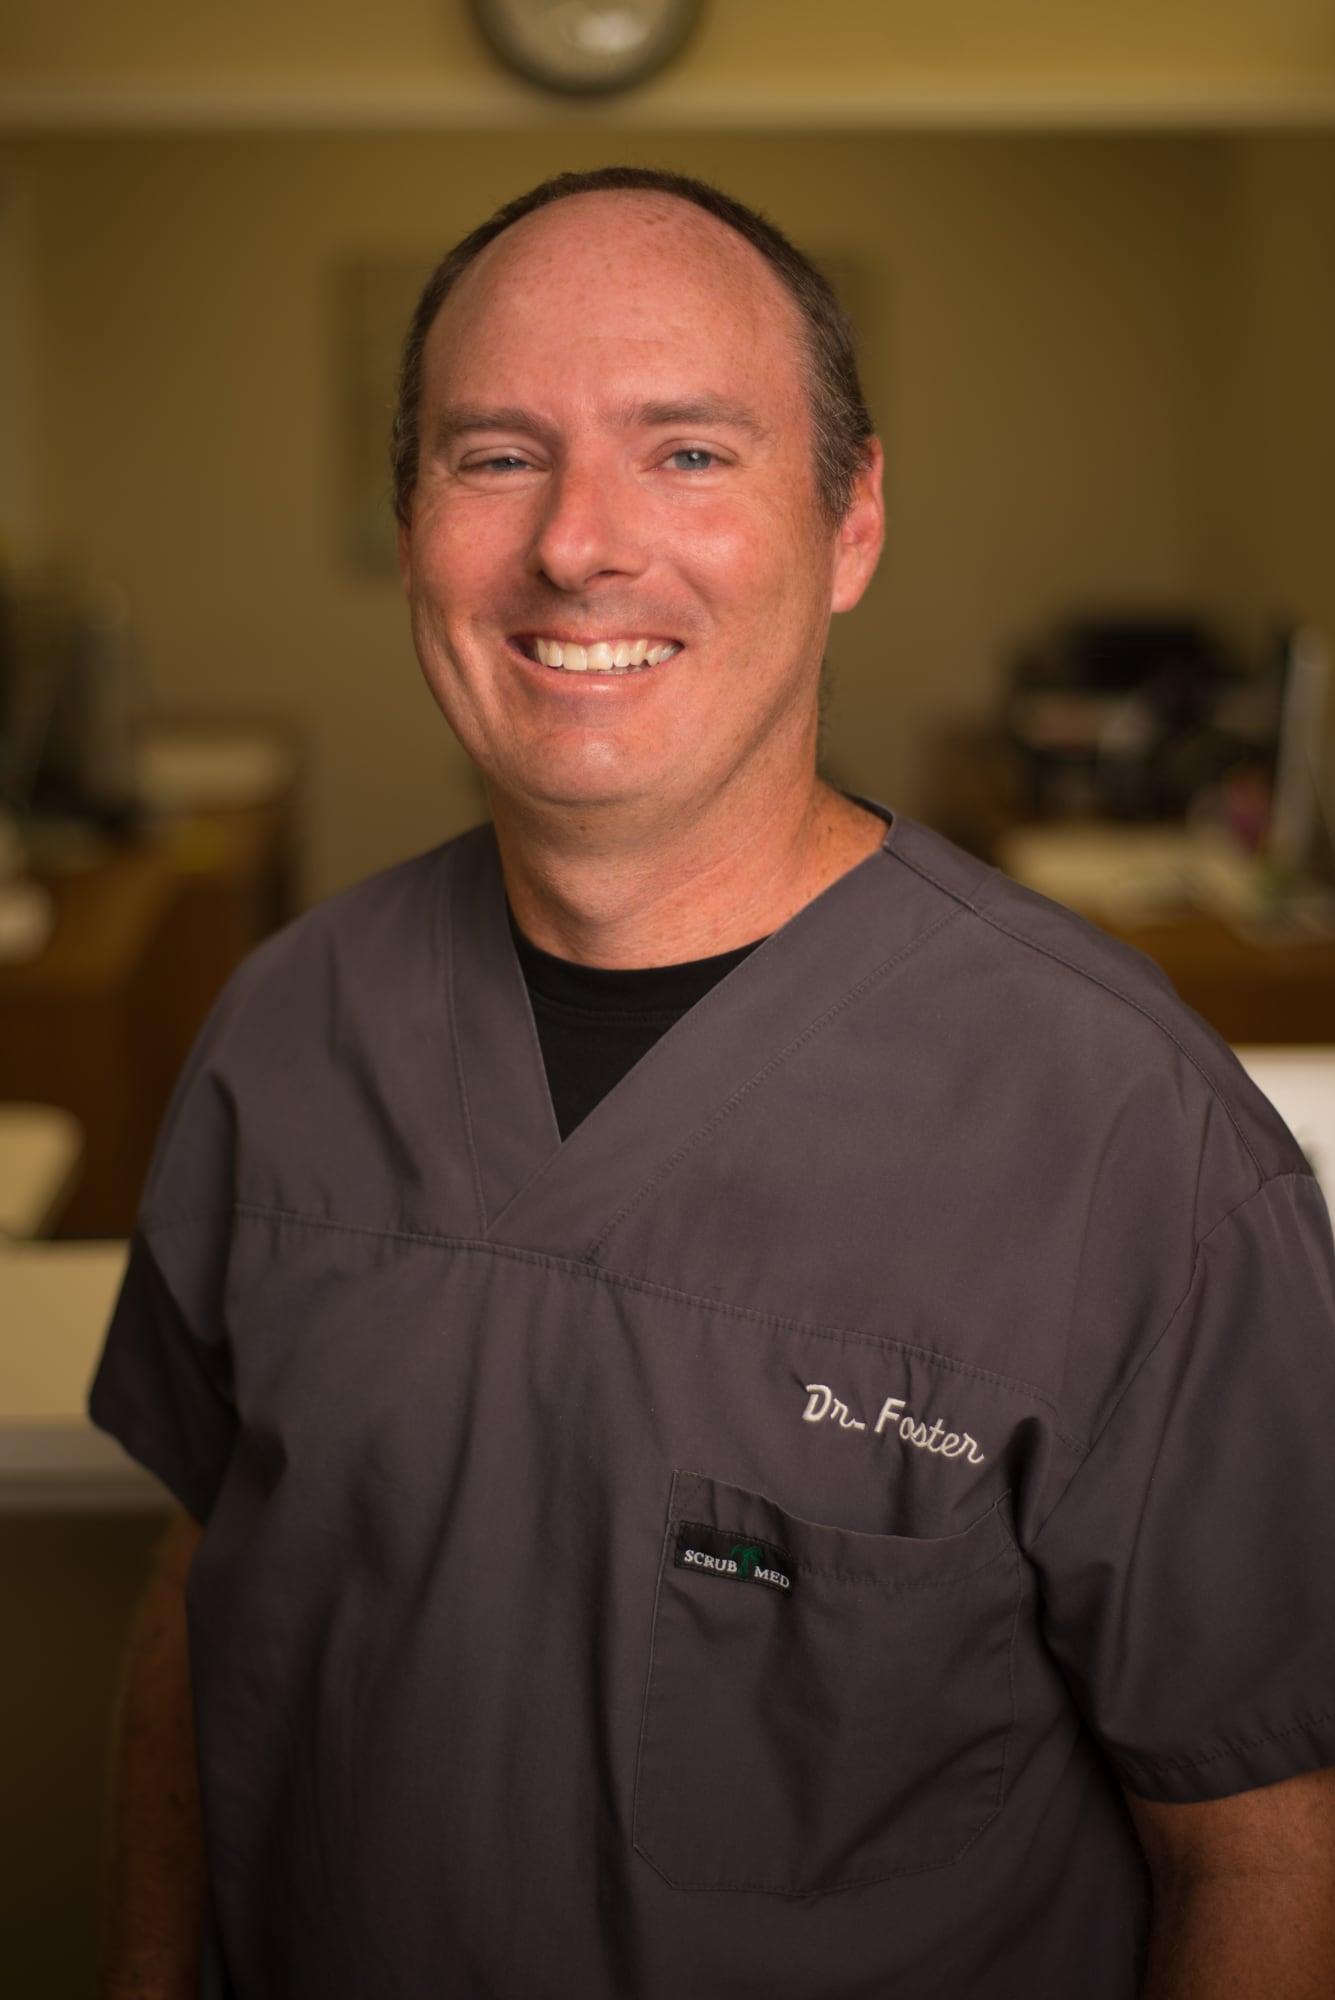 Darren G Foster General Dentistry